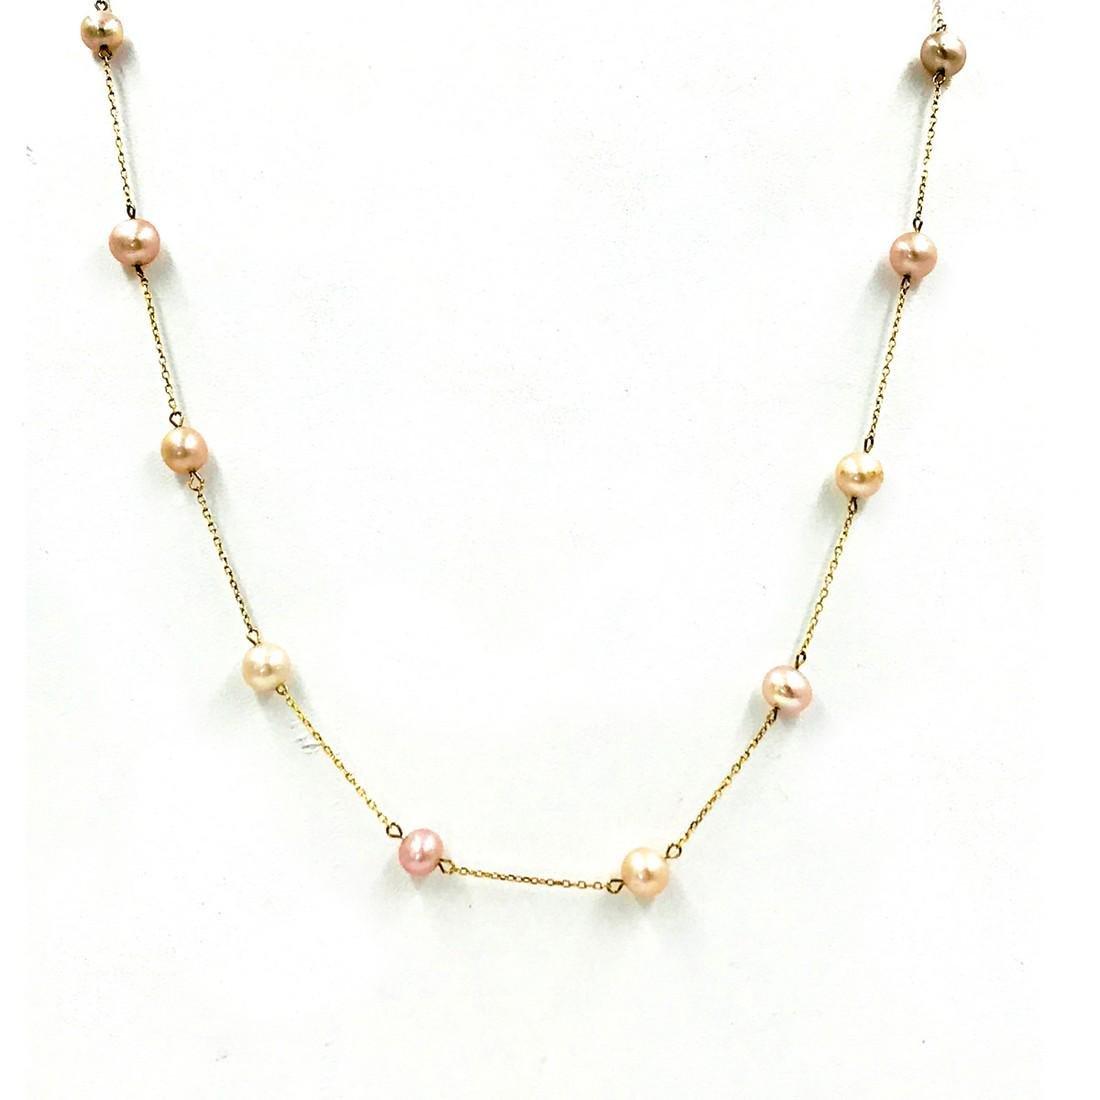 Pearl Strand Chain, Gold Karat Chain Necklace